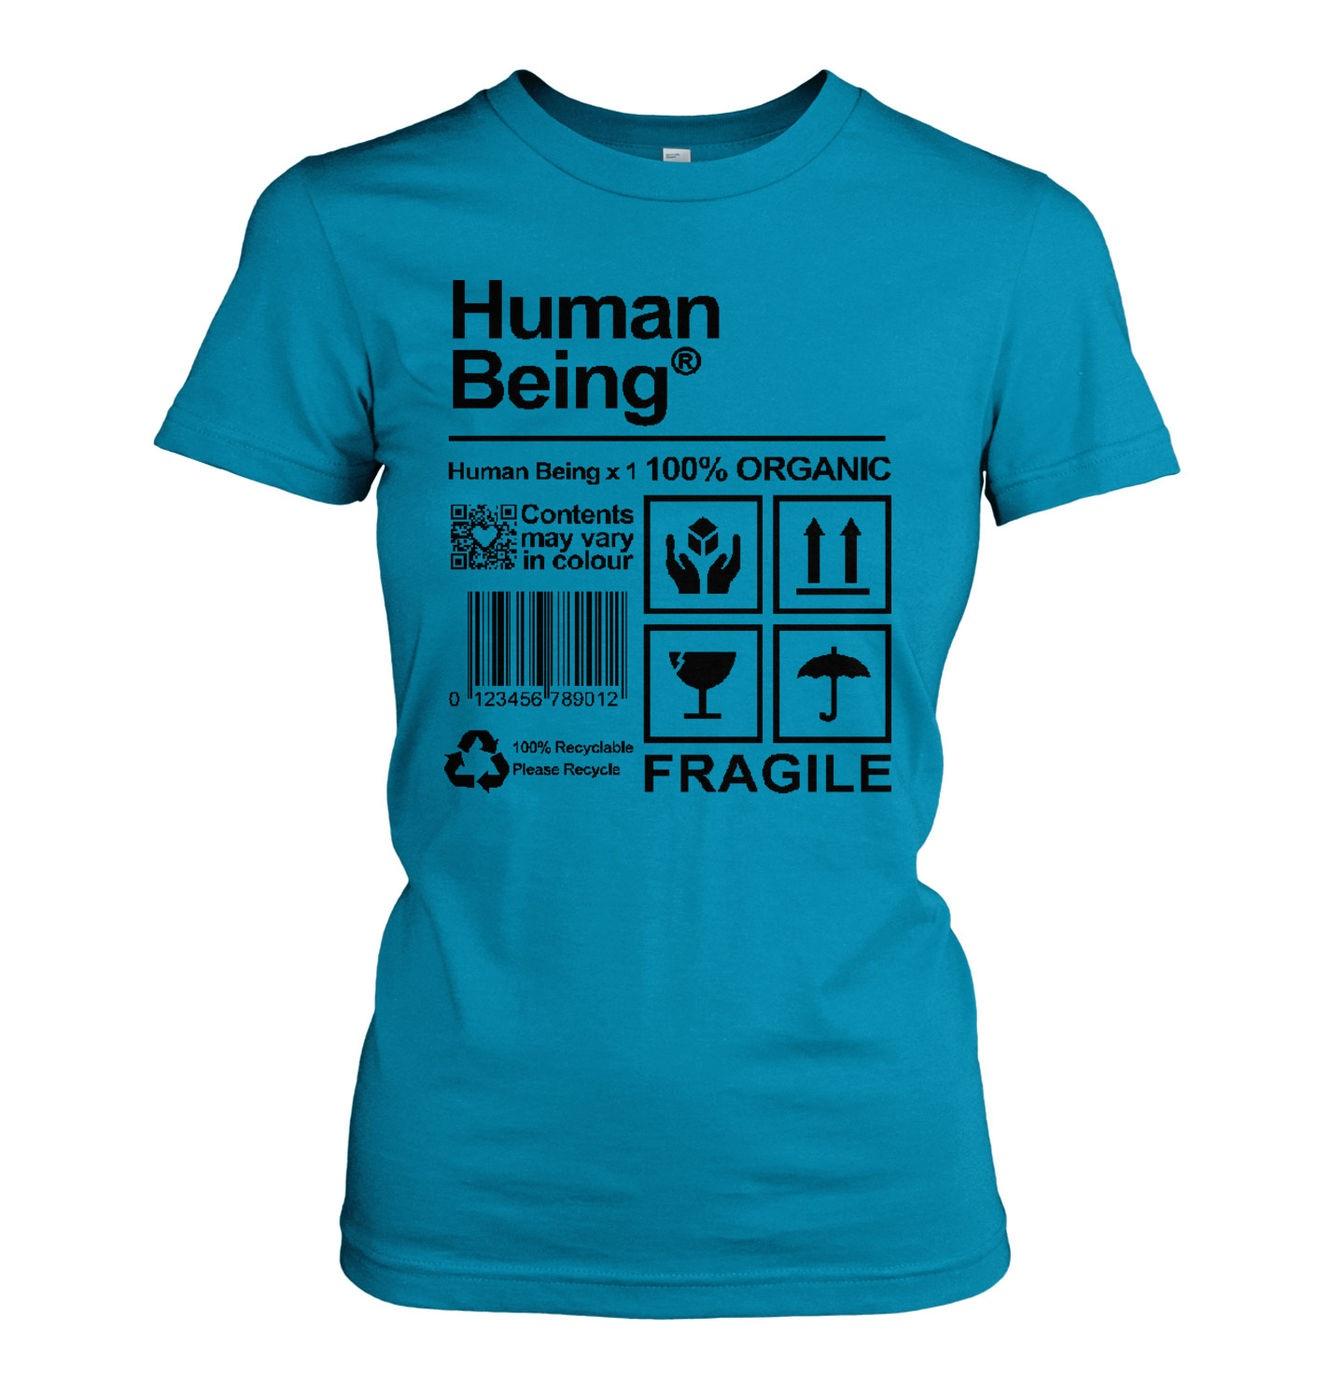 Human Being women's t-shirt